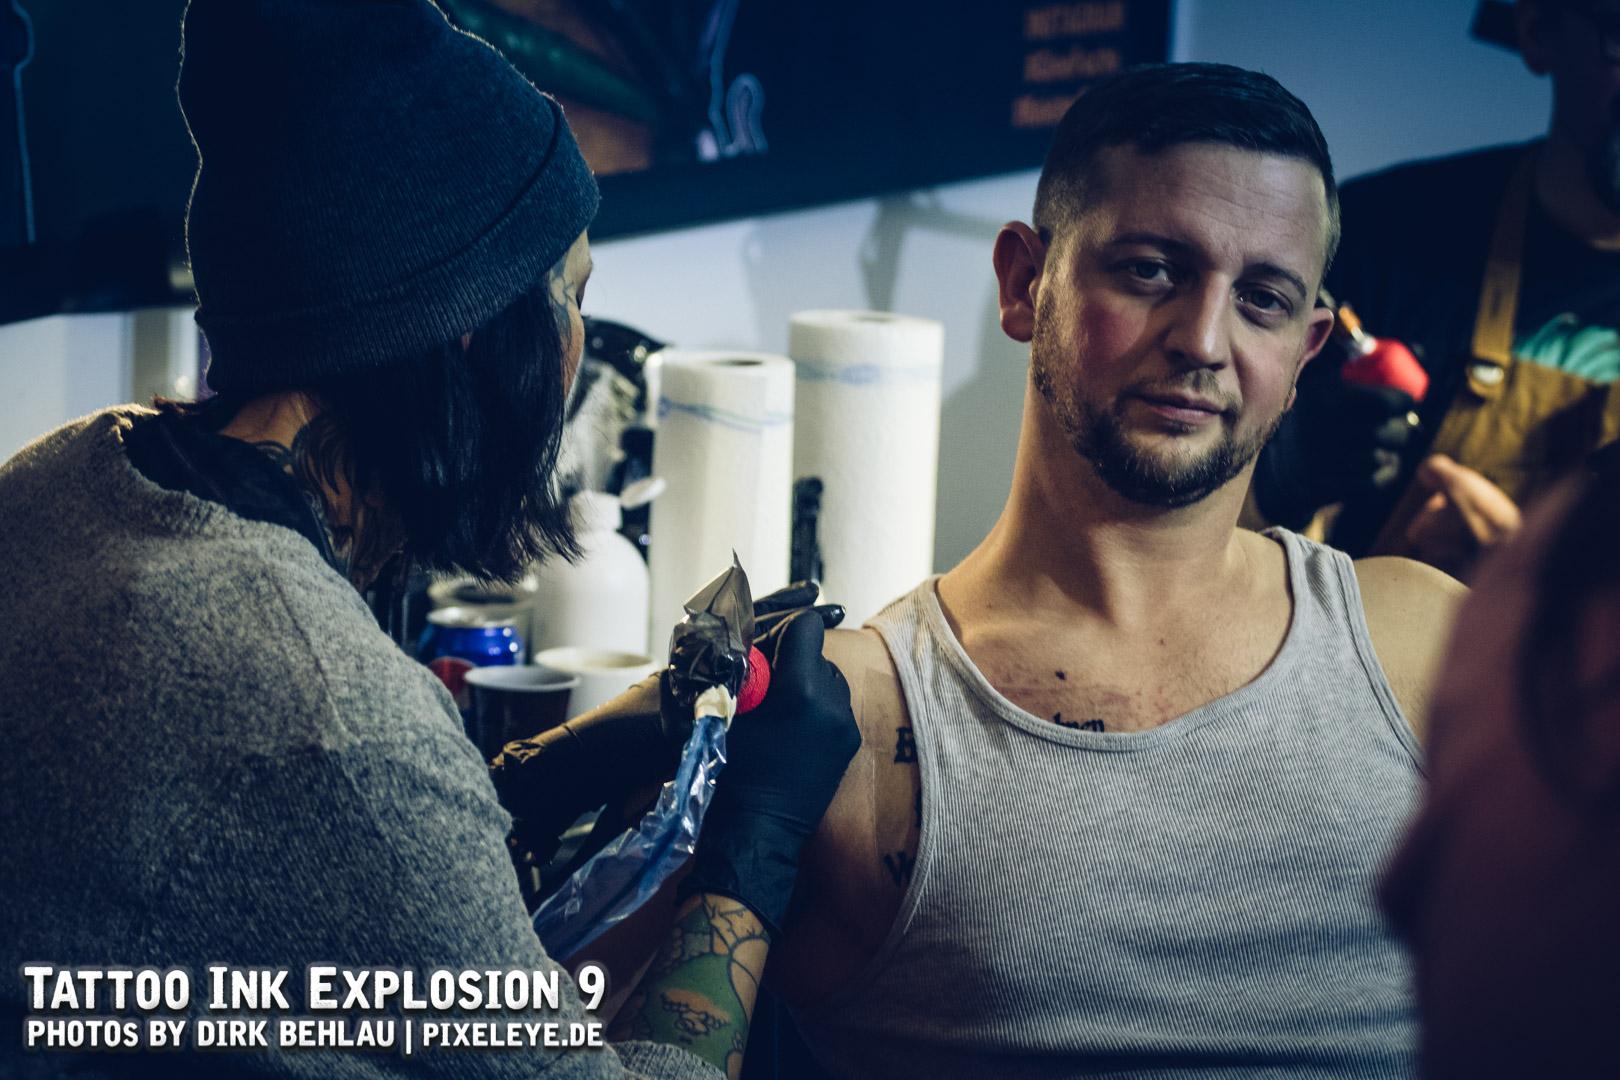 Tattoo Ink Explosion 2018 WEB by Dirk Behlau-1323.jpg